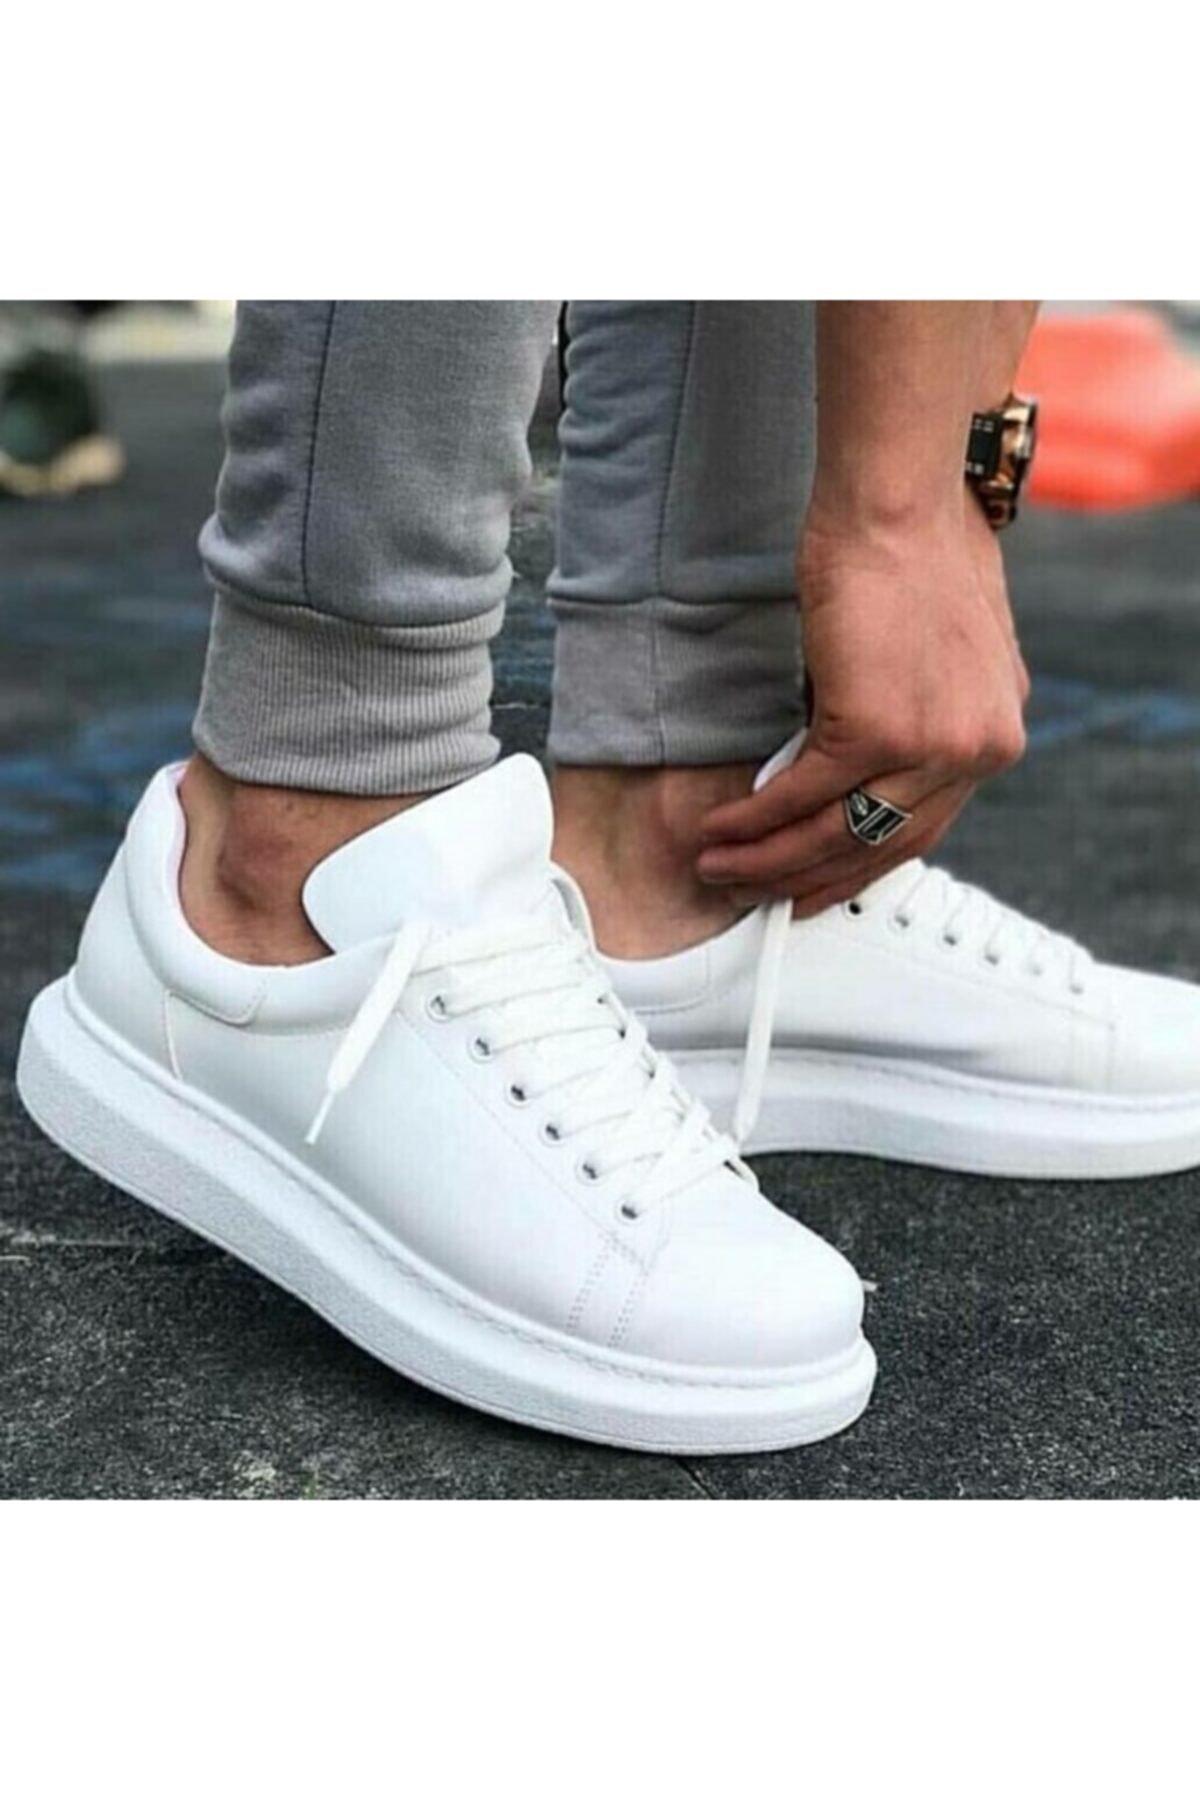 Chekich Ch Ch257 Bt Erkek Ayakkabı Beyaz 2